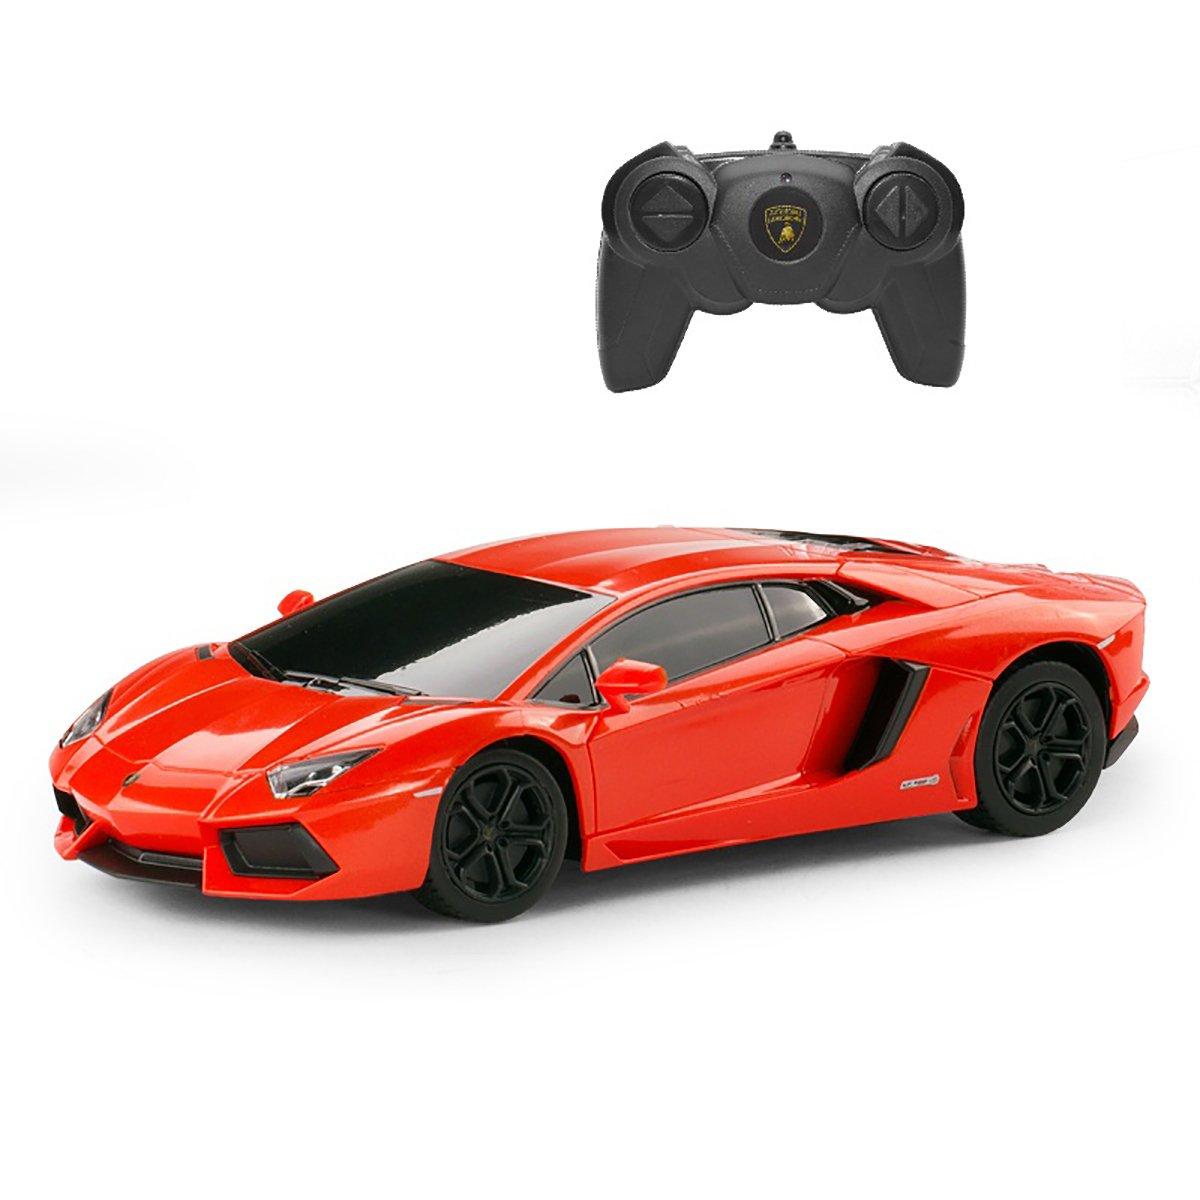 Masinuta cu telecomanda Rastar Lamborghini Aventador LP700 RC, Portocaliu, 1:24